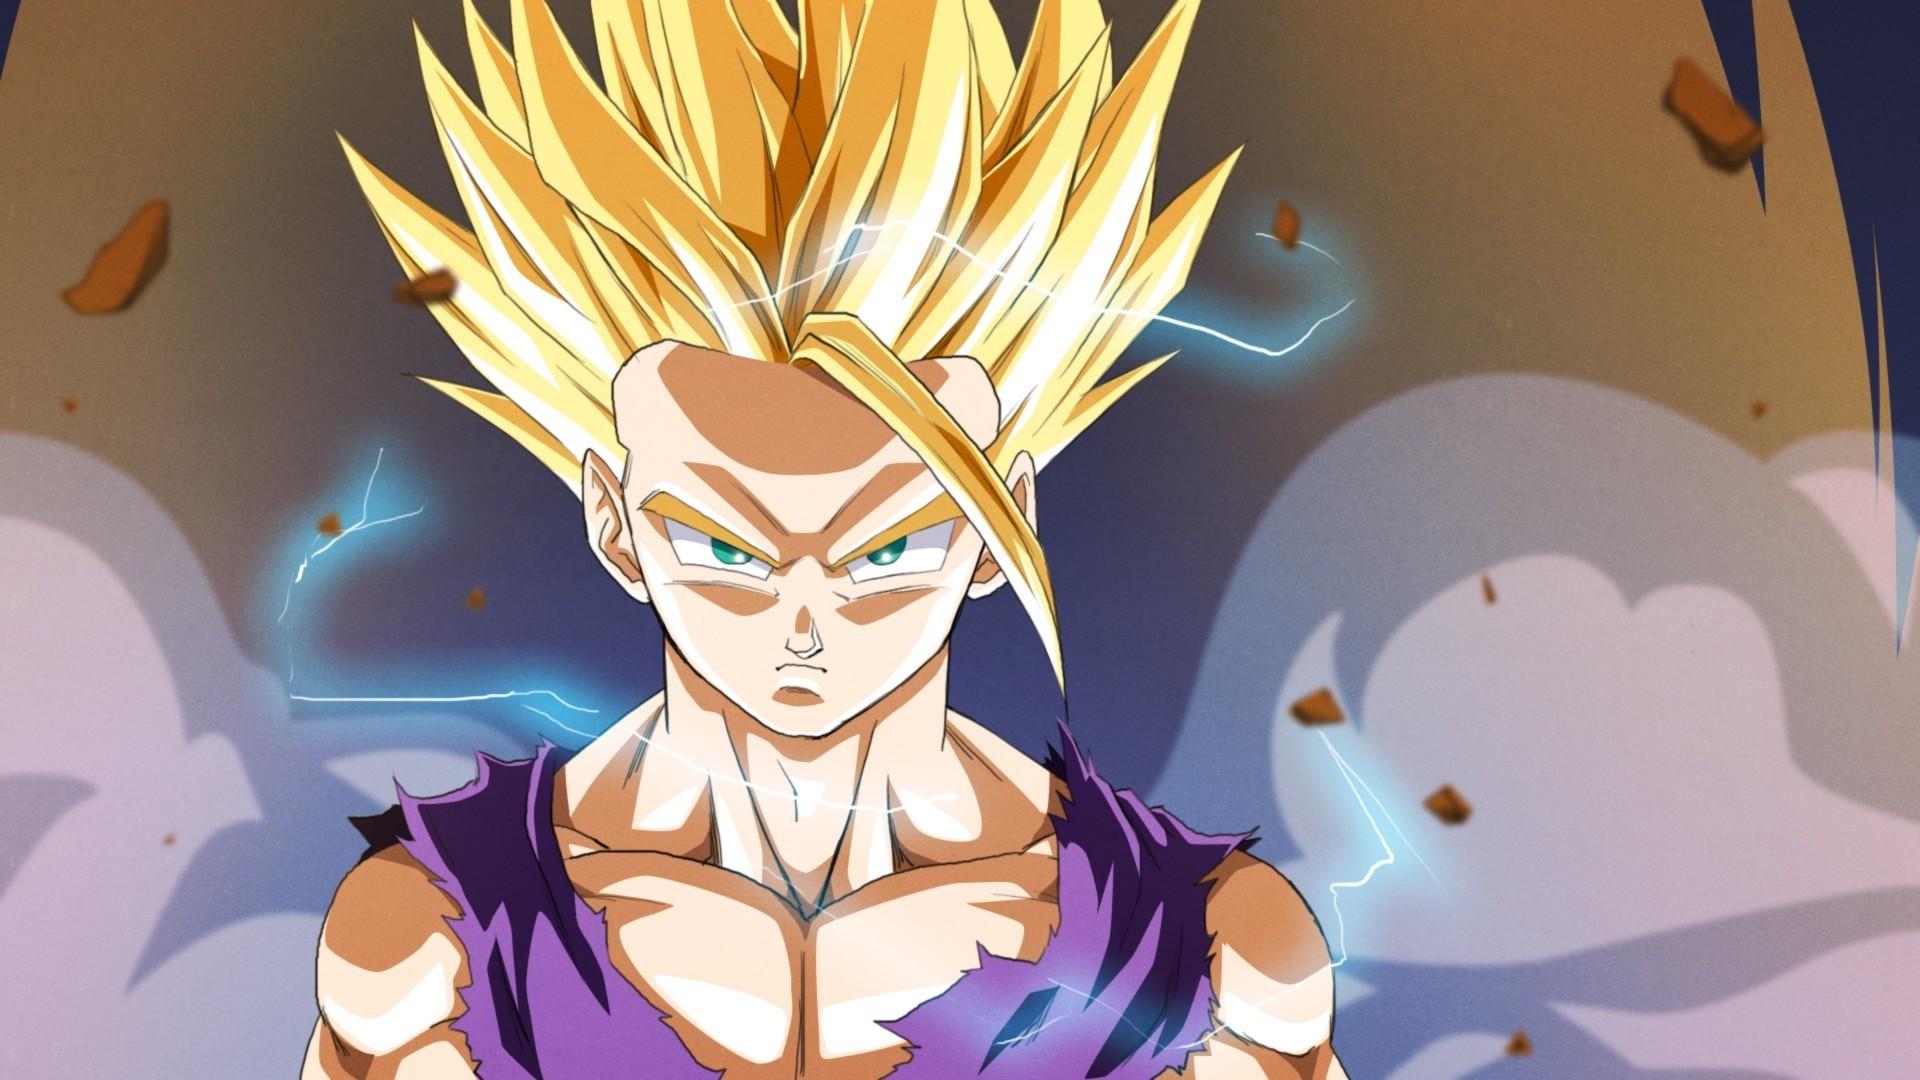 Fond D écran Illustration Anime Dessin Animé Dragon